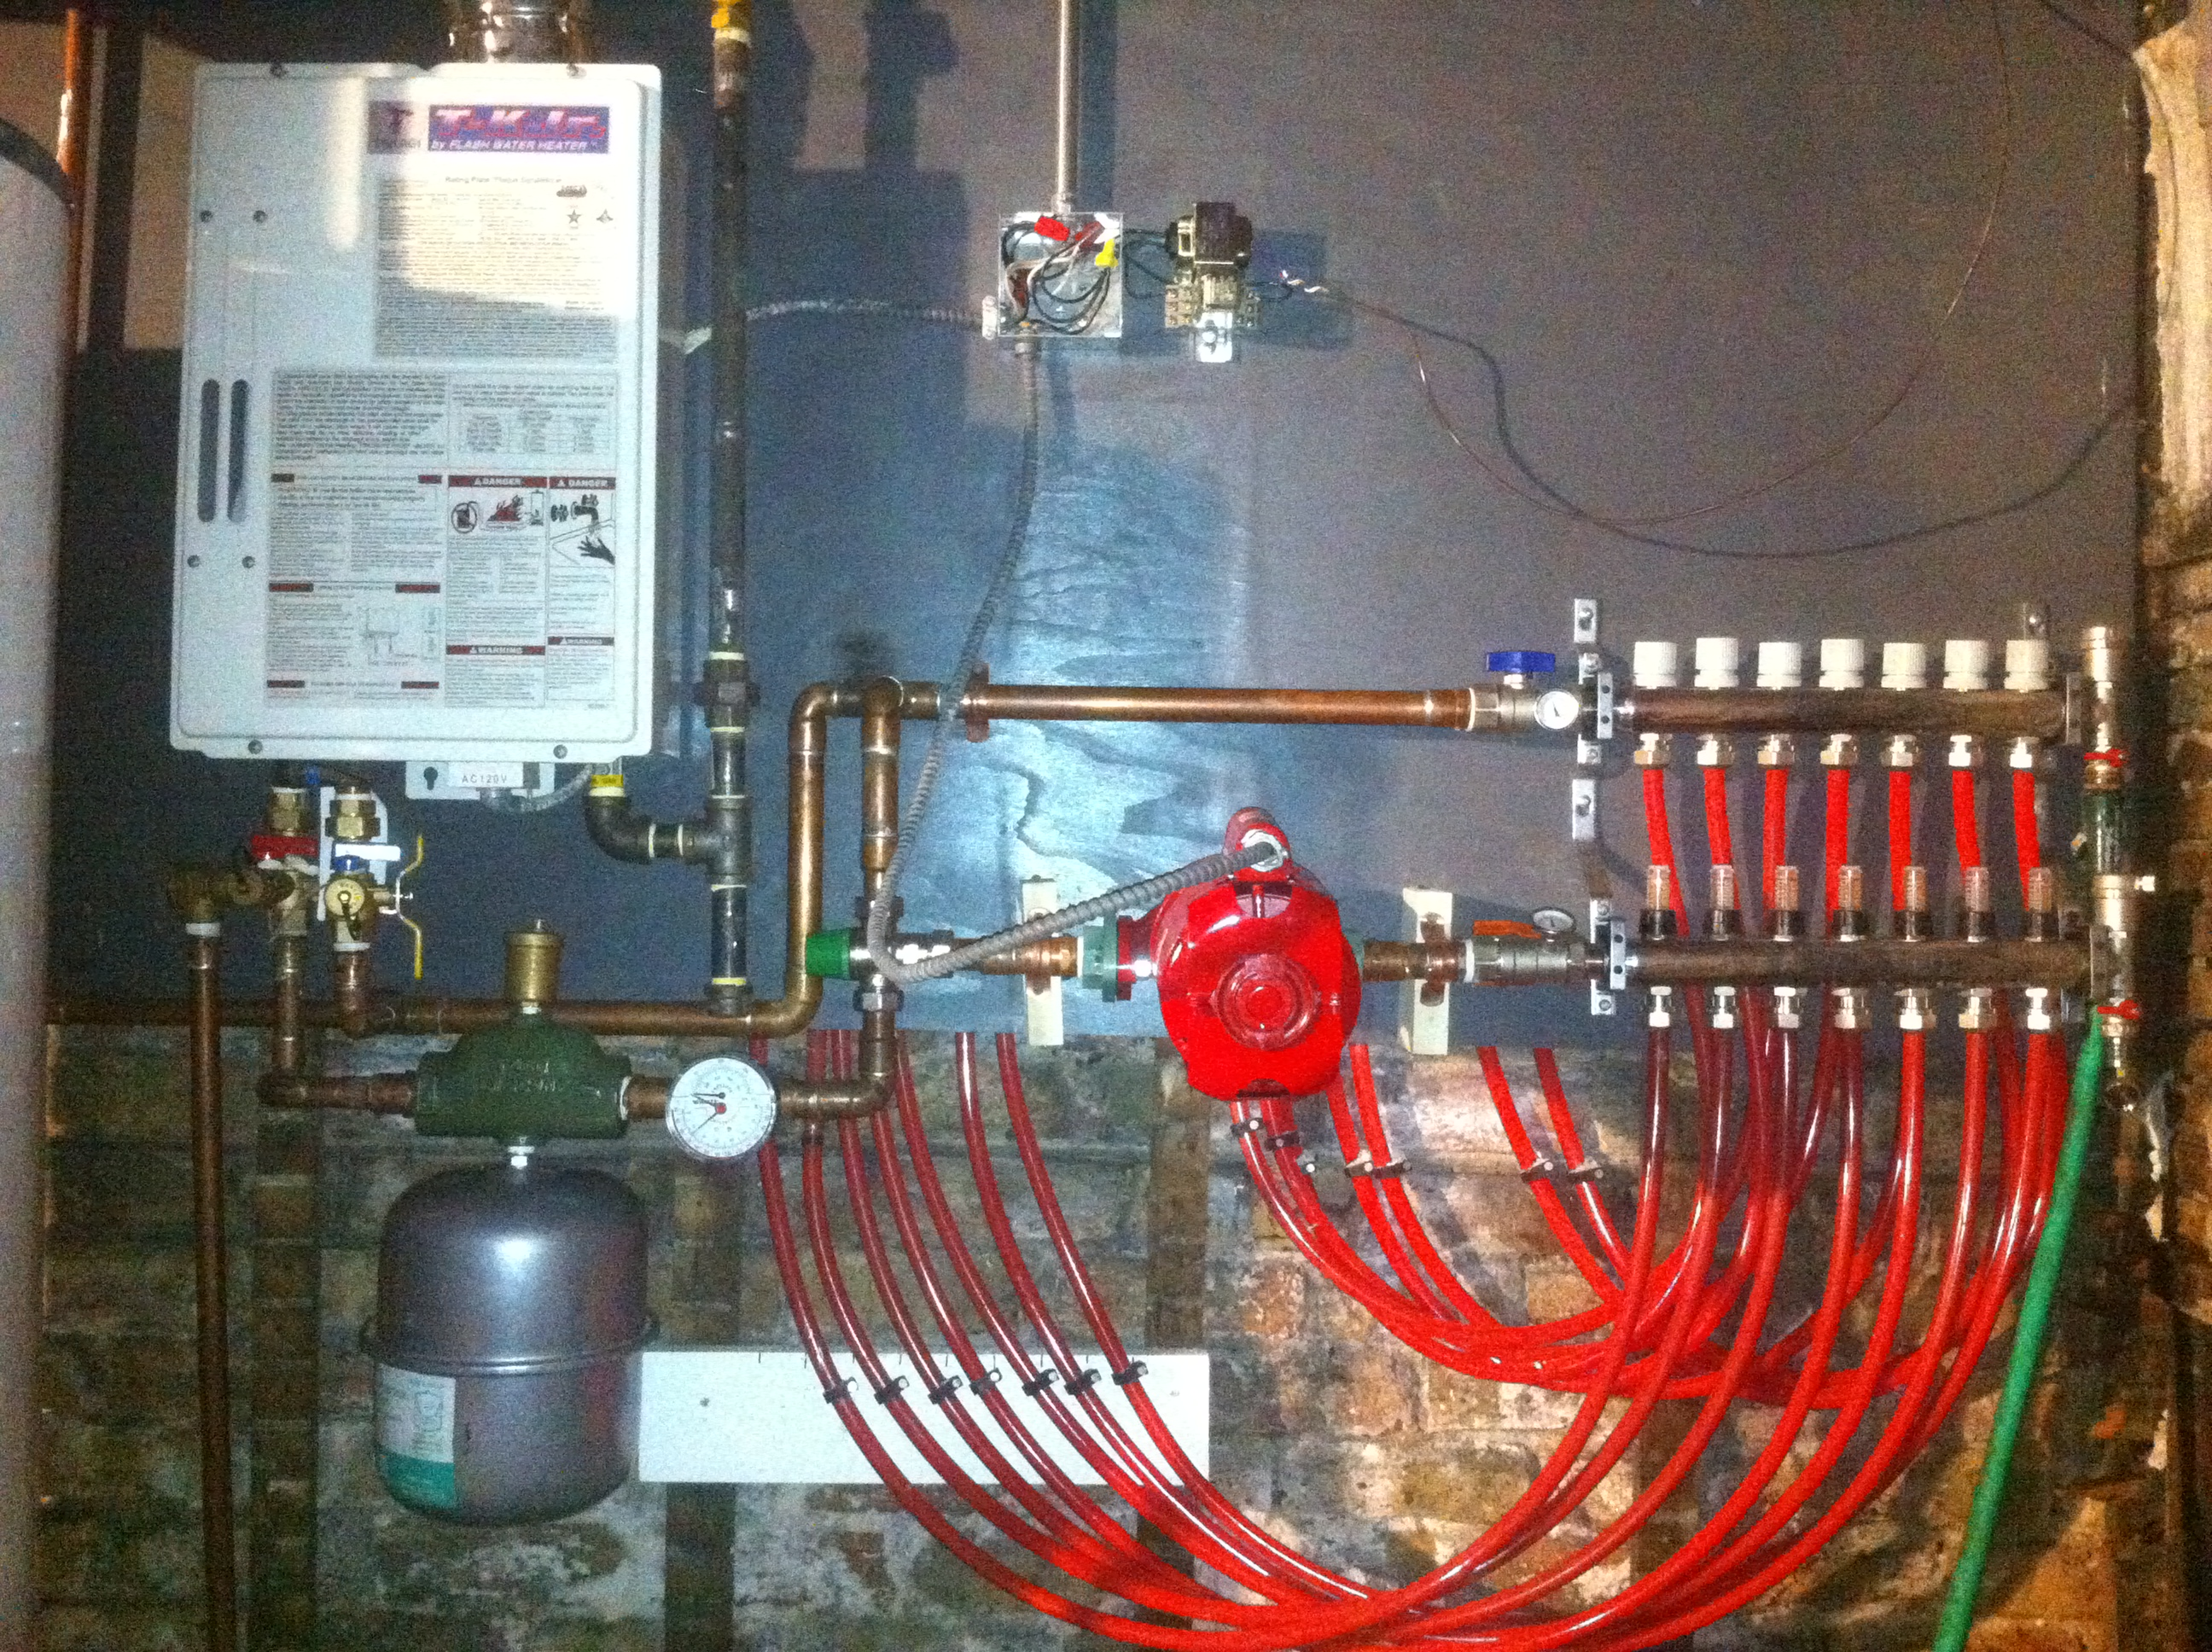 plumbing manifold diagram sccm deployment radiant floor layout  matttroy